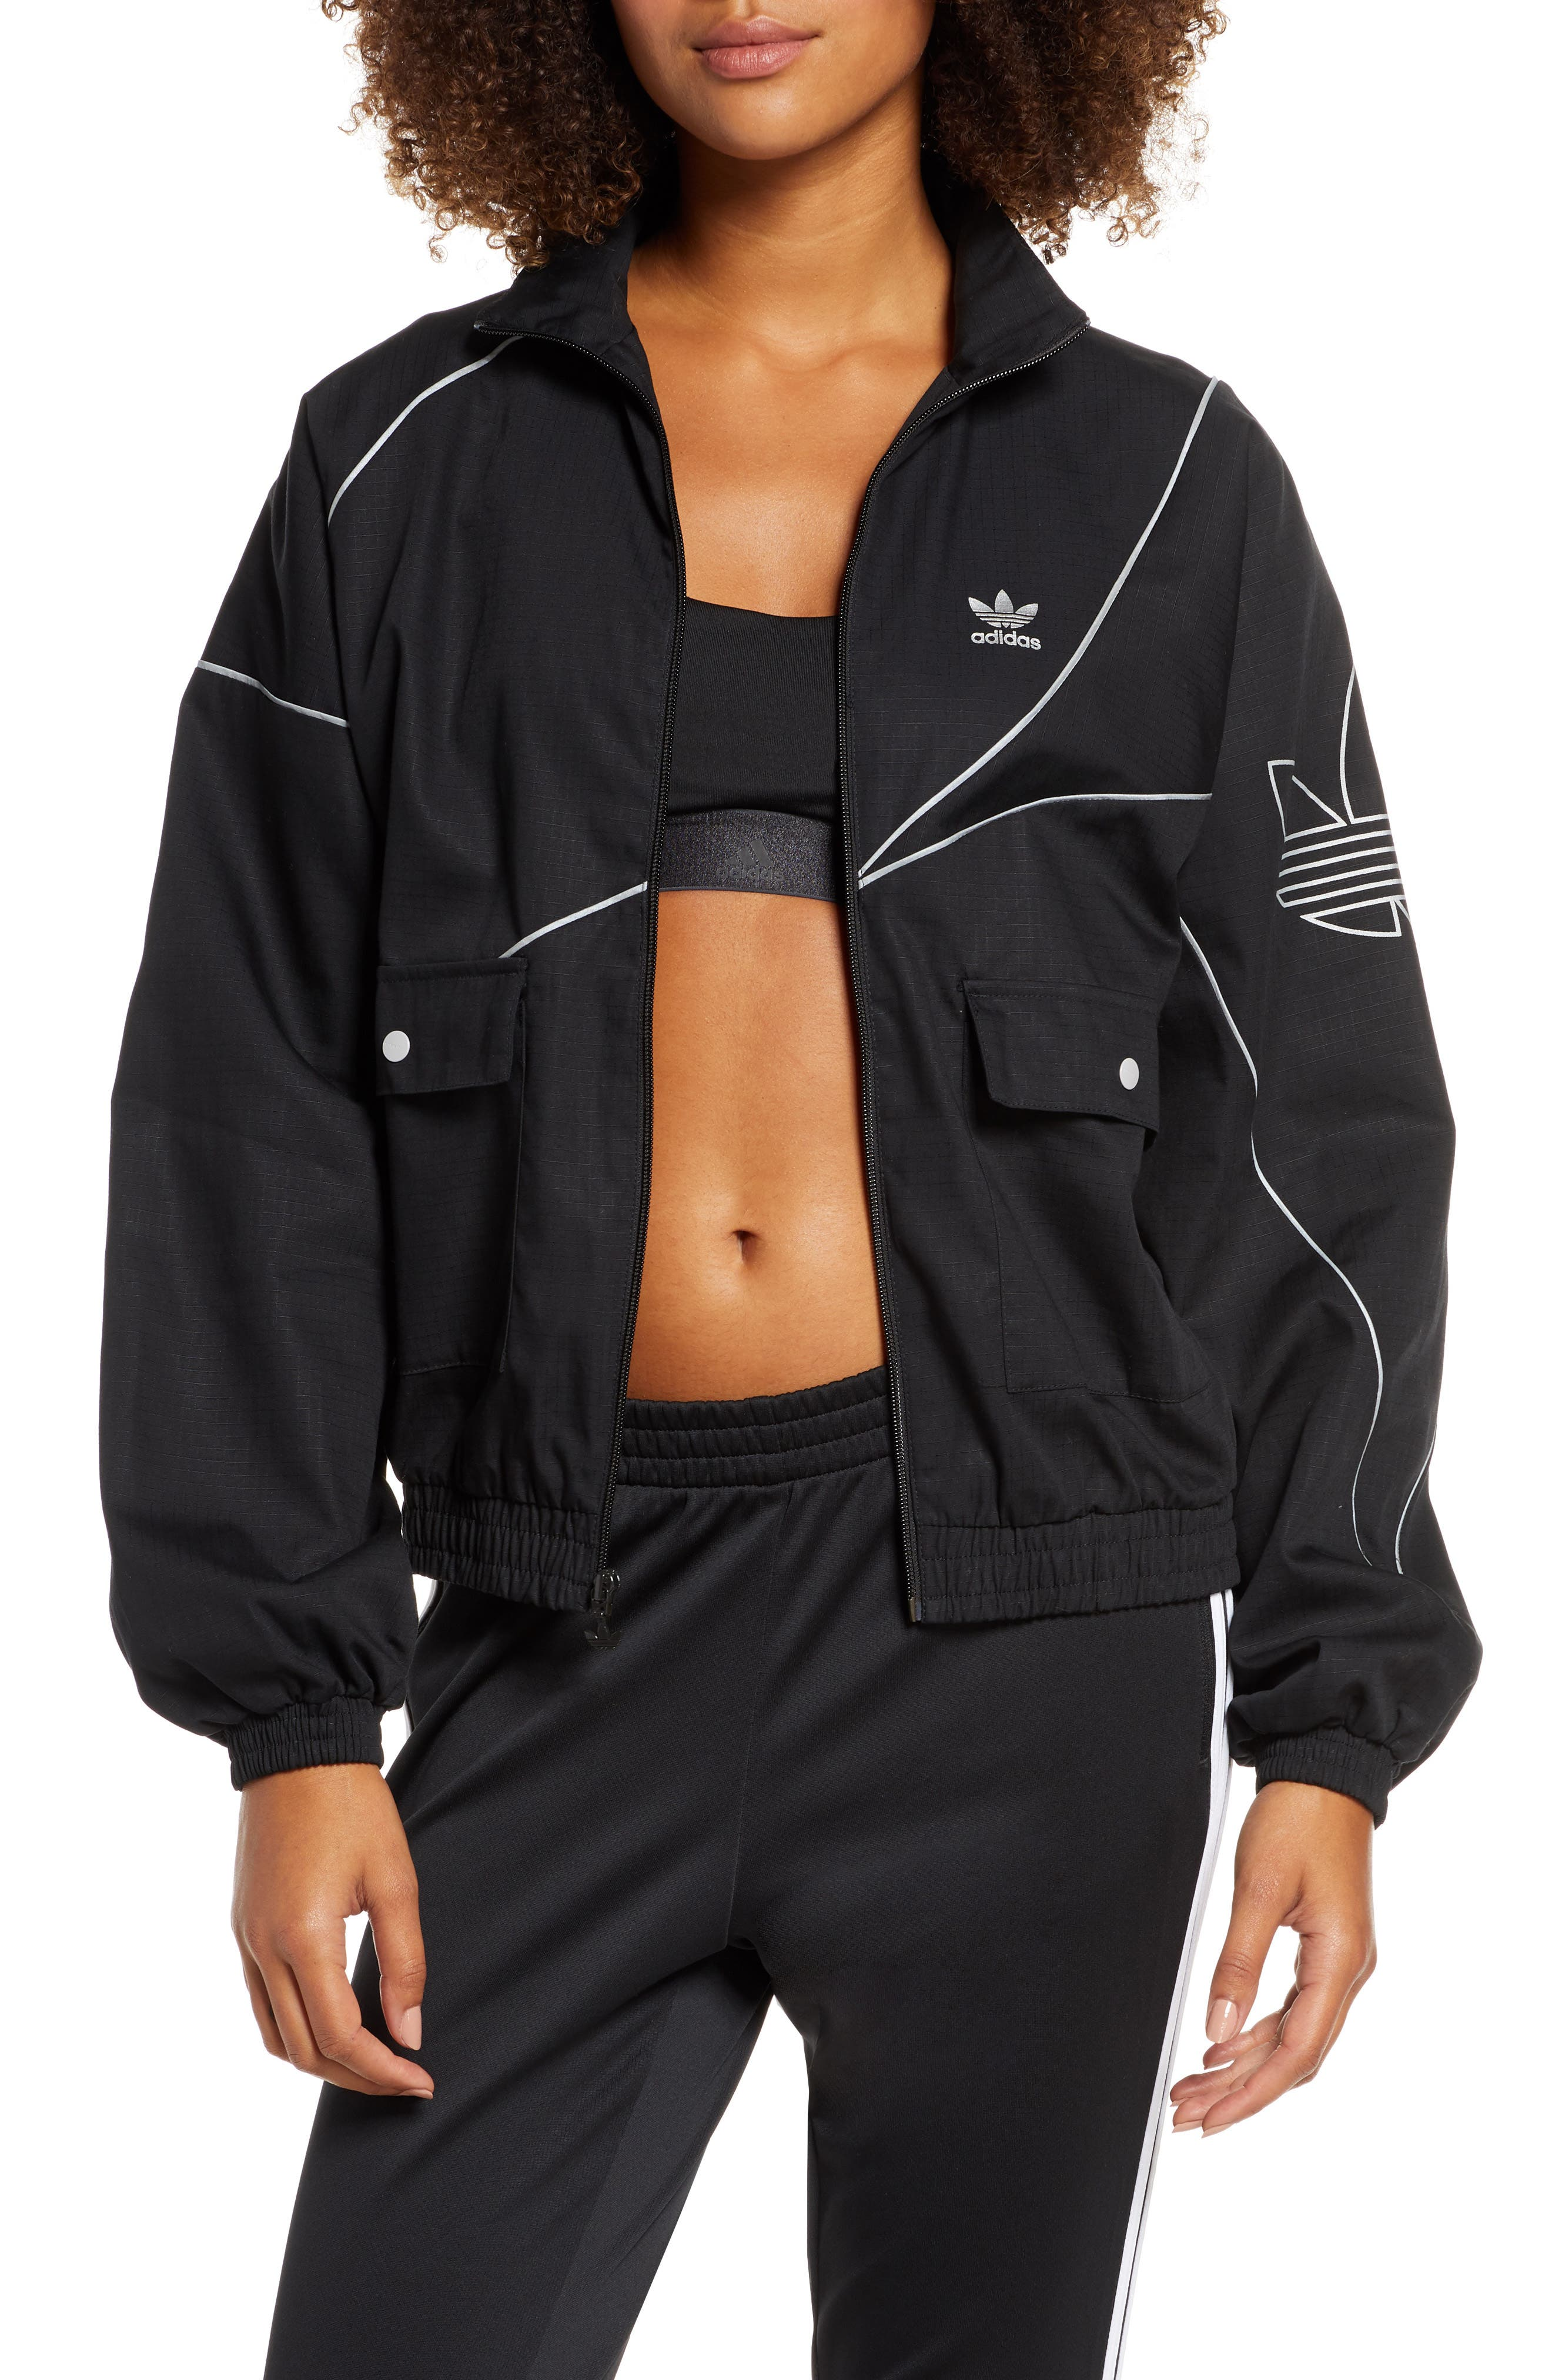 adidas jacket   Nordstrom